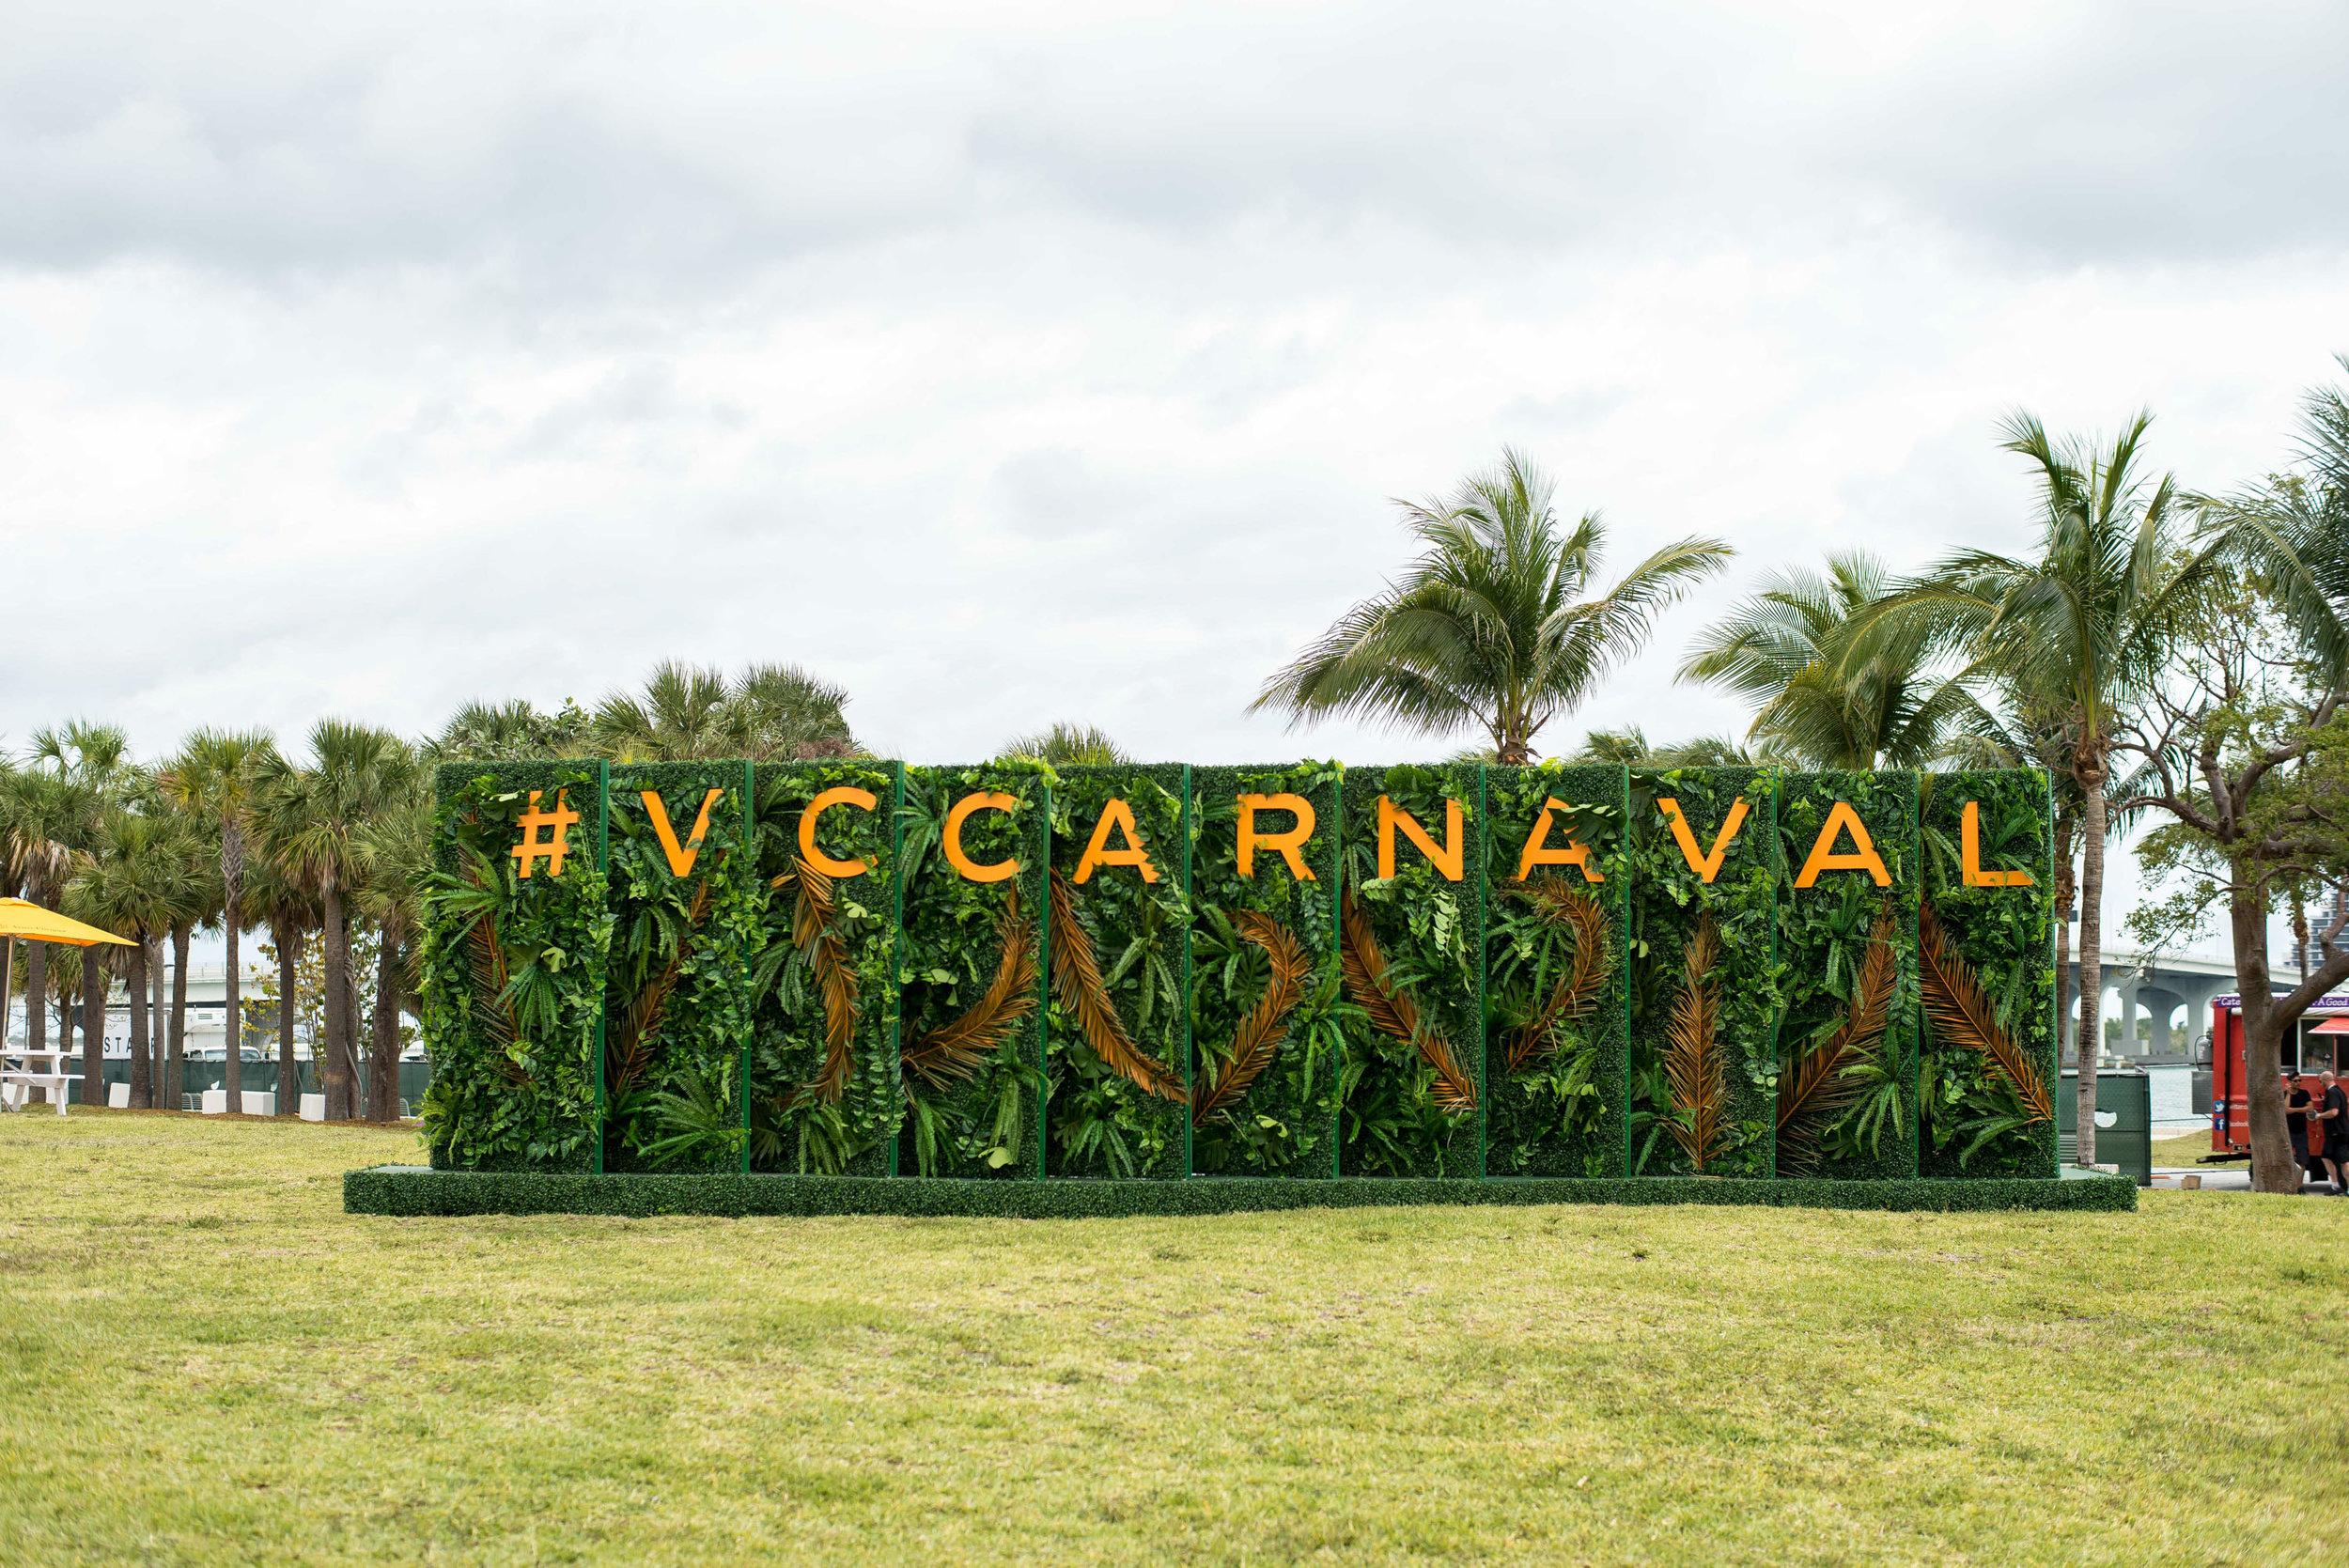 Carnaval-Miami-2018-28.jpg